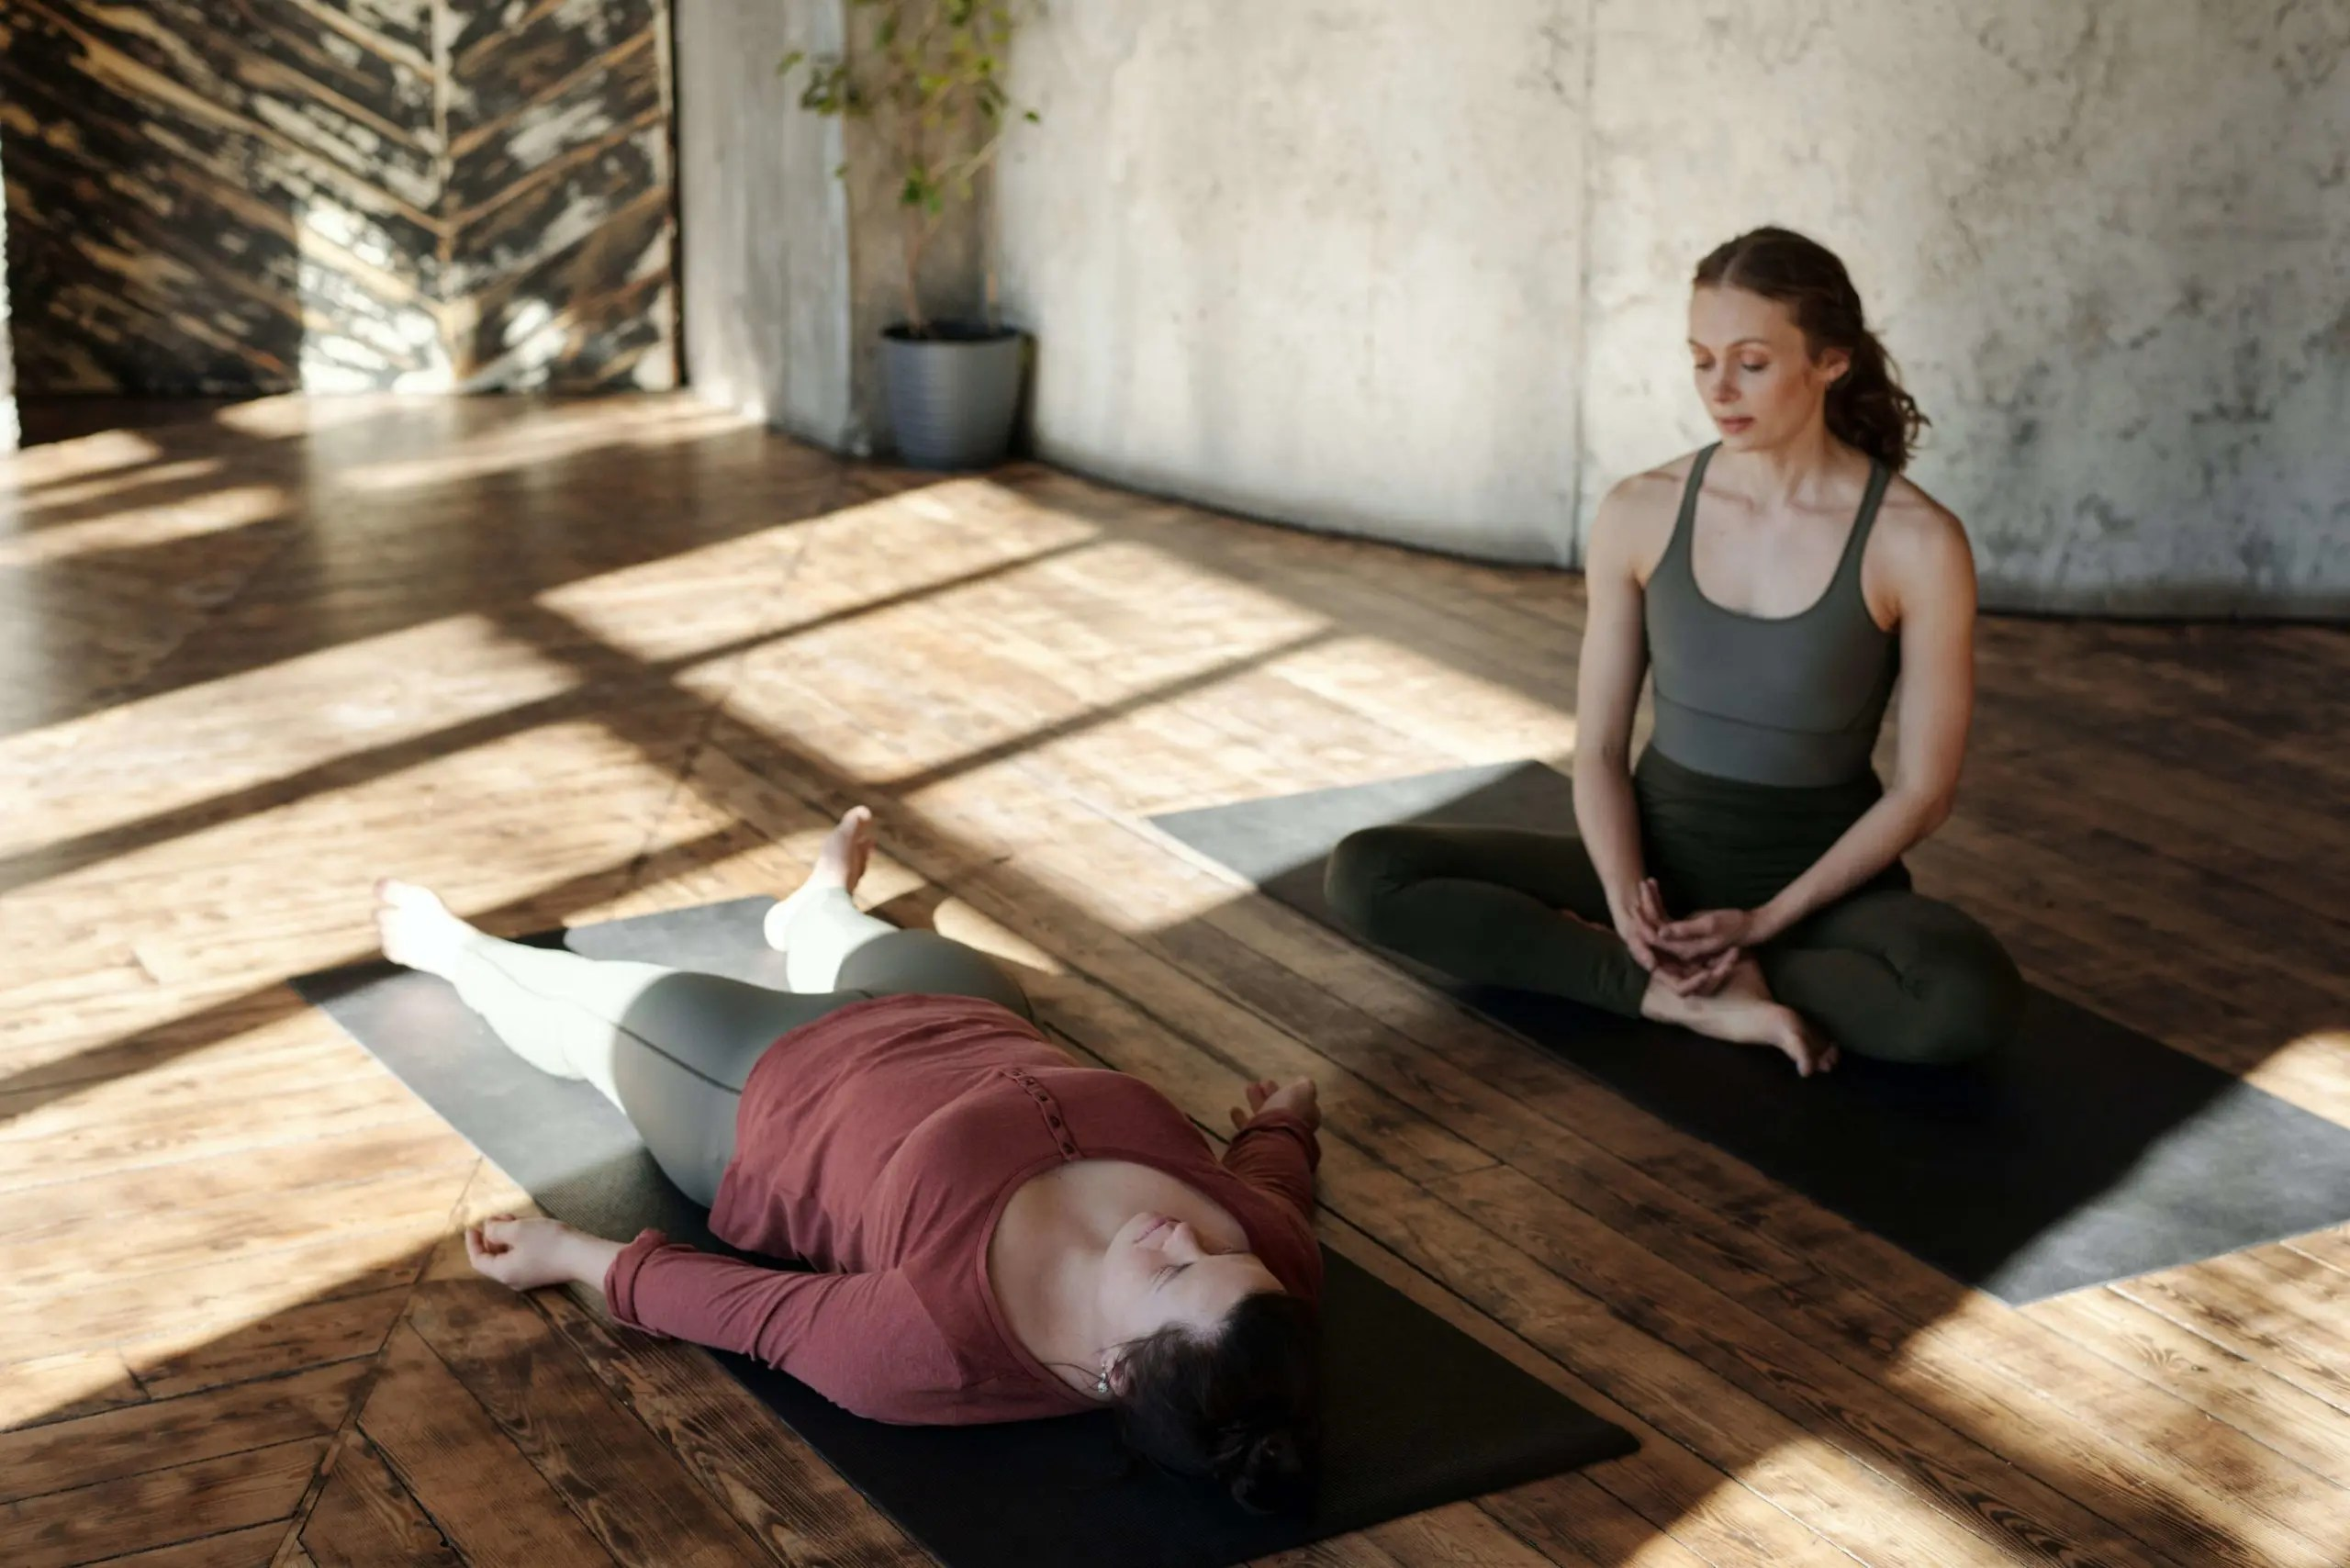 Meditation Positions - Lying down